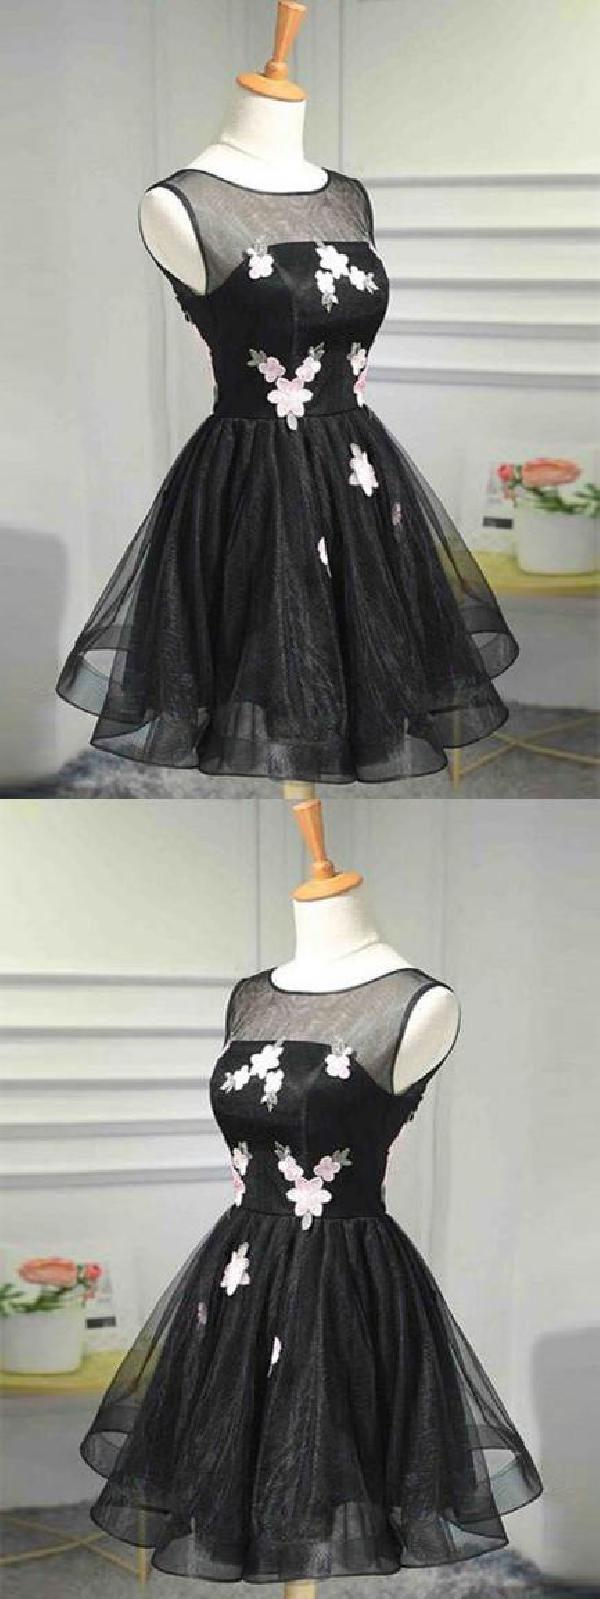 Prom dress black promdressblack homecoming dress aline